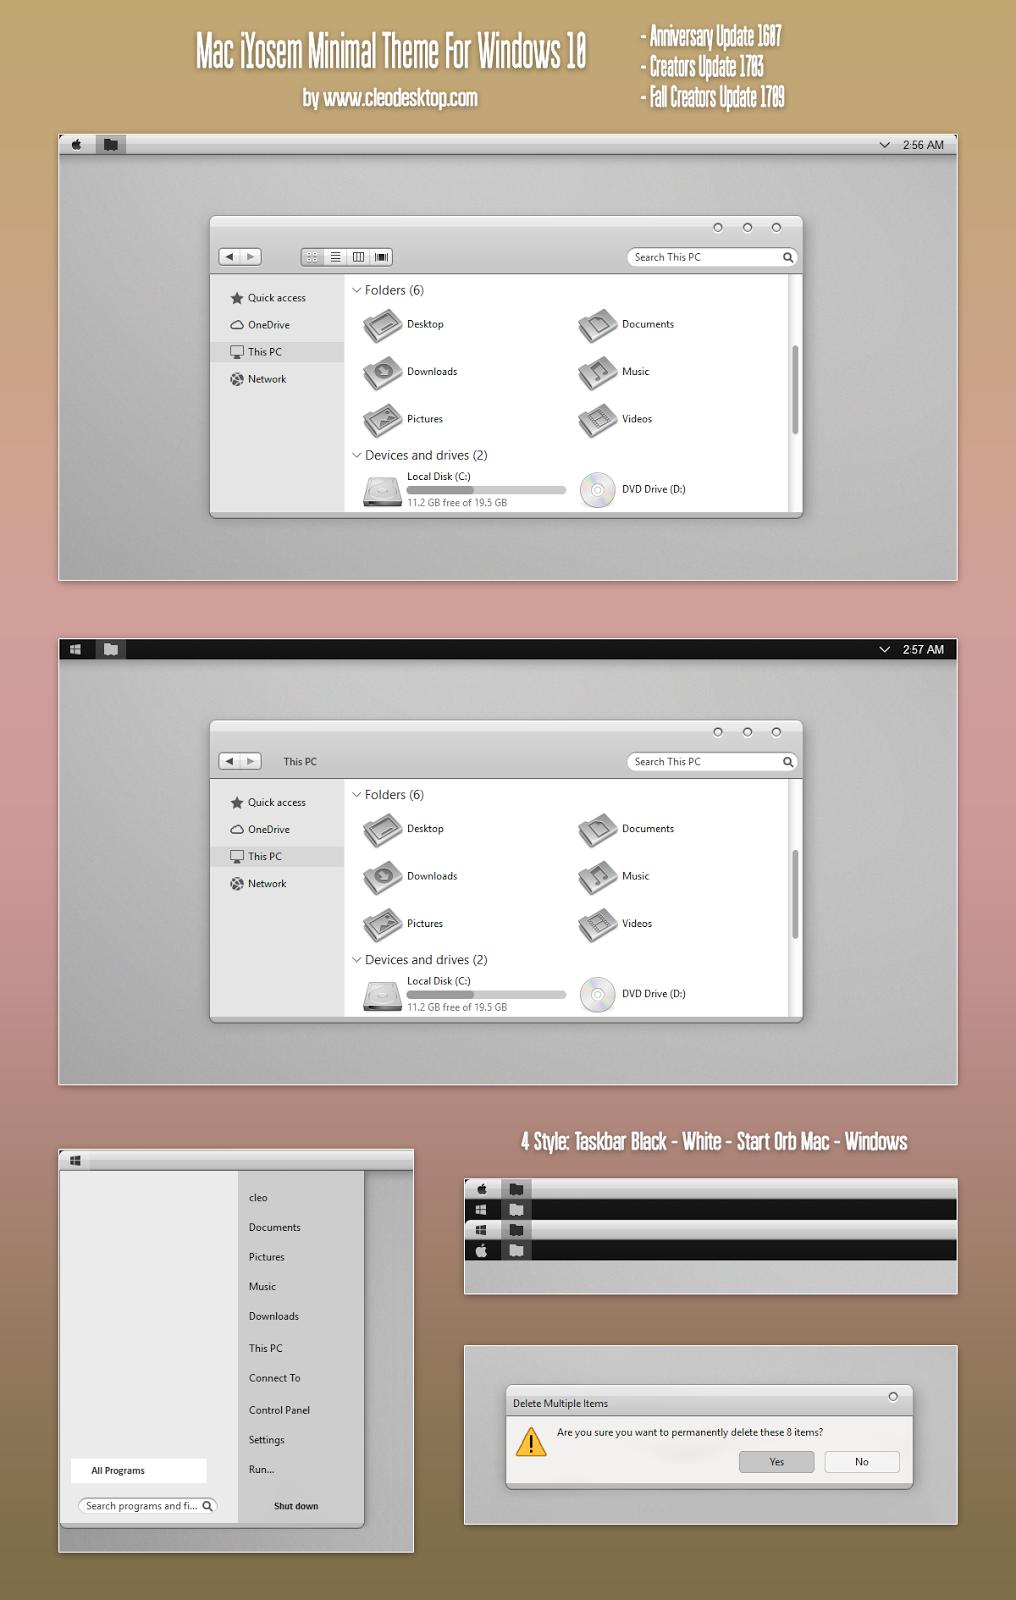 Mac iYosem Minimal Theme Windows10 Fall Creators Update 1709